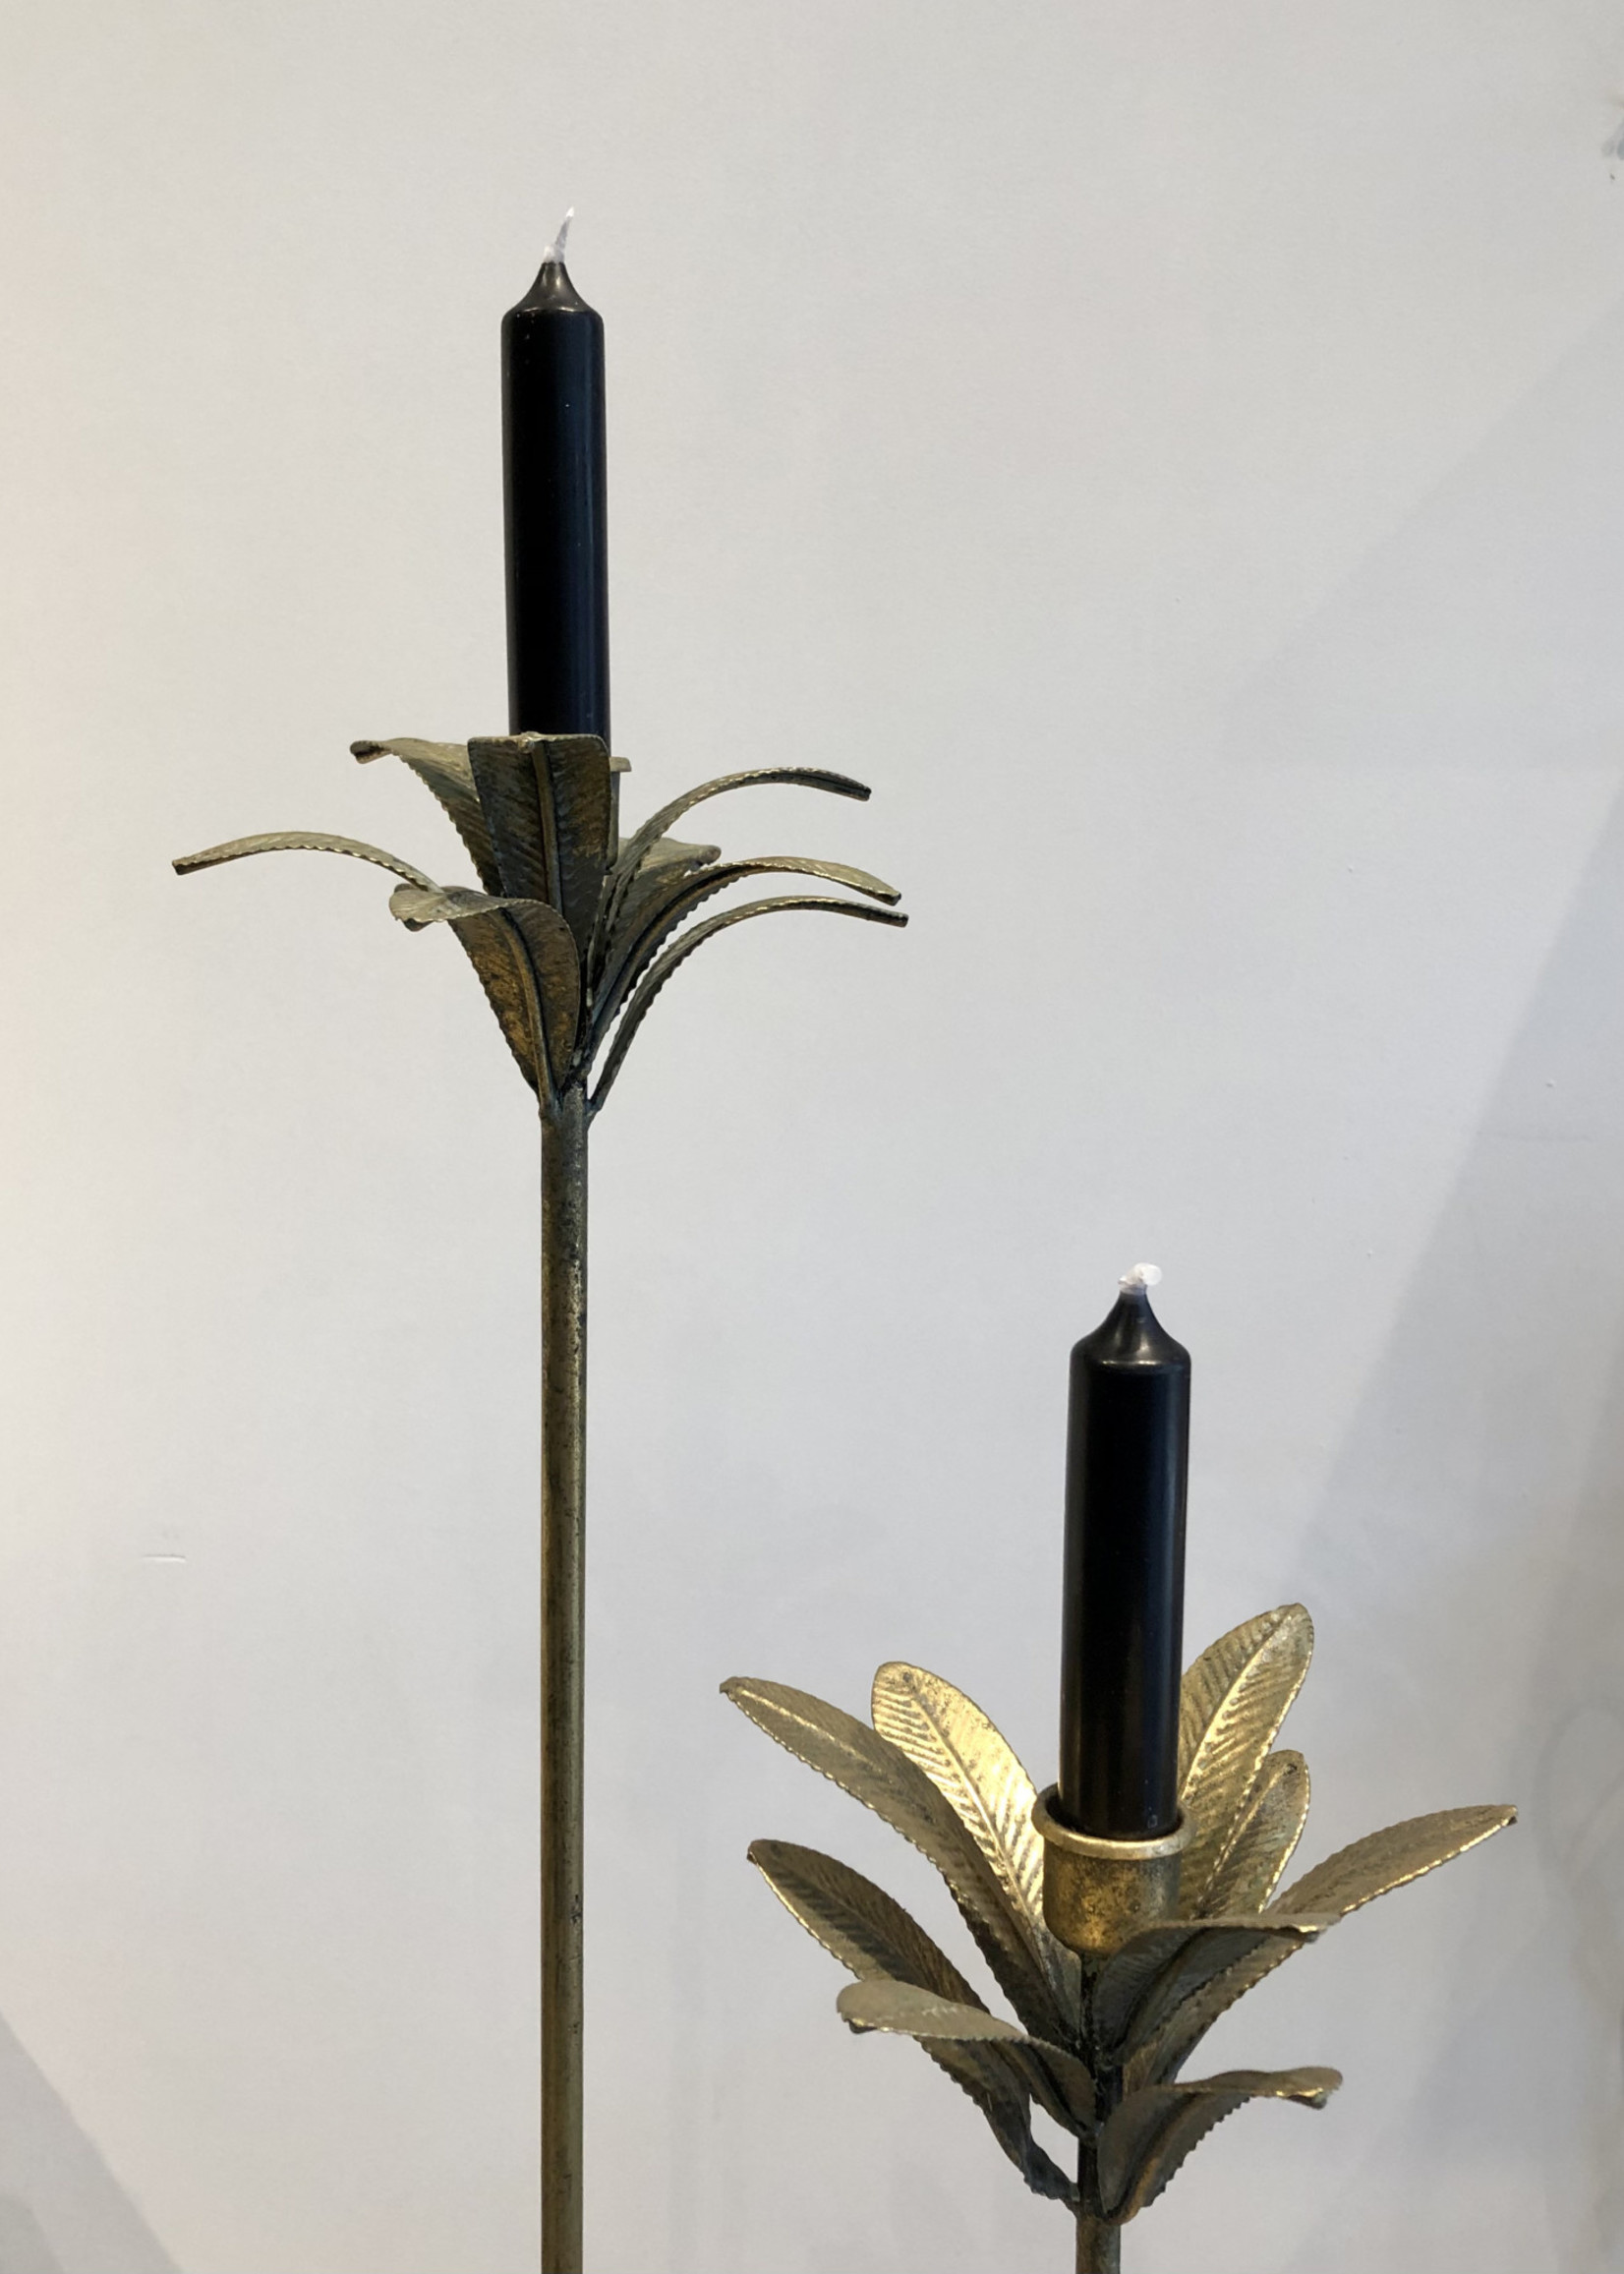 Rustik Lys Pakje van 6 kaarsjes 2x12 cm Zwart